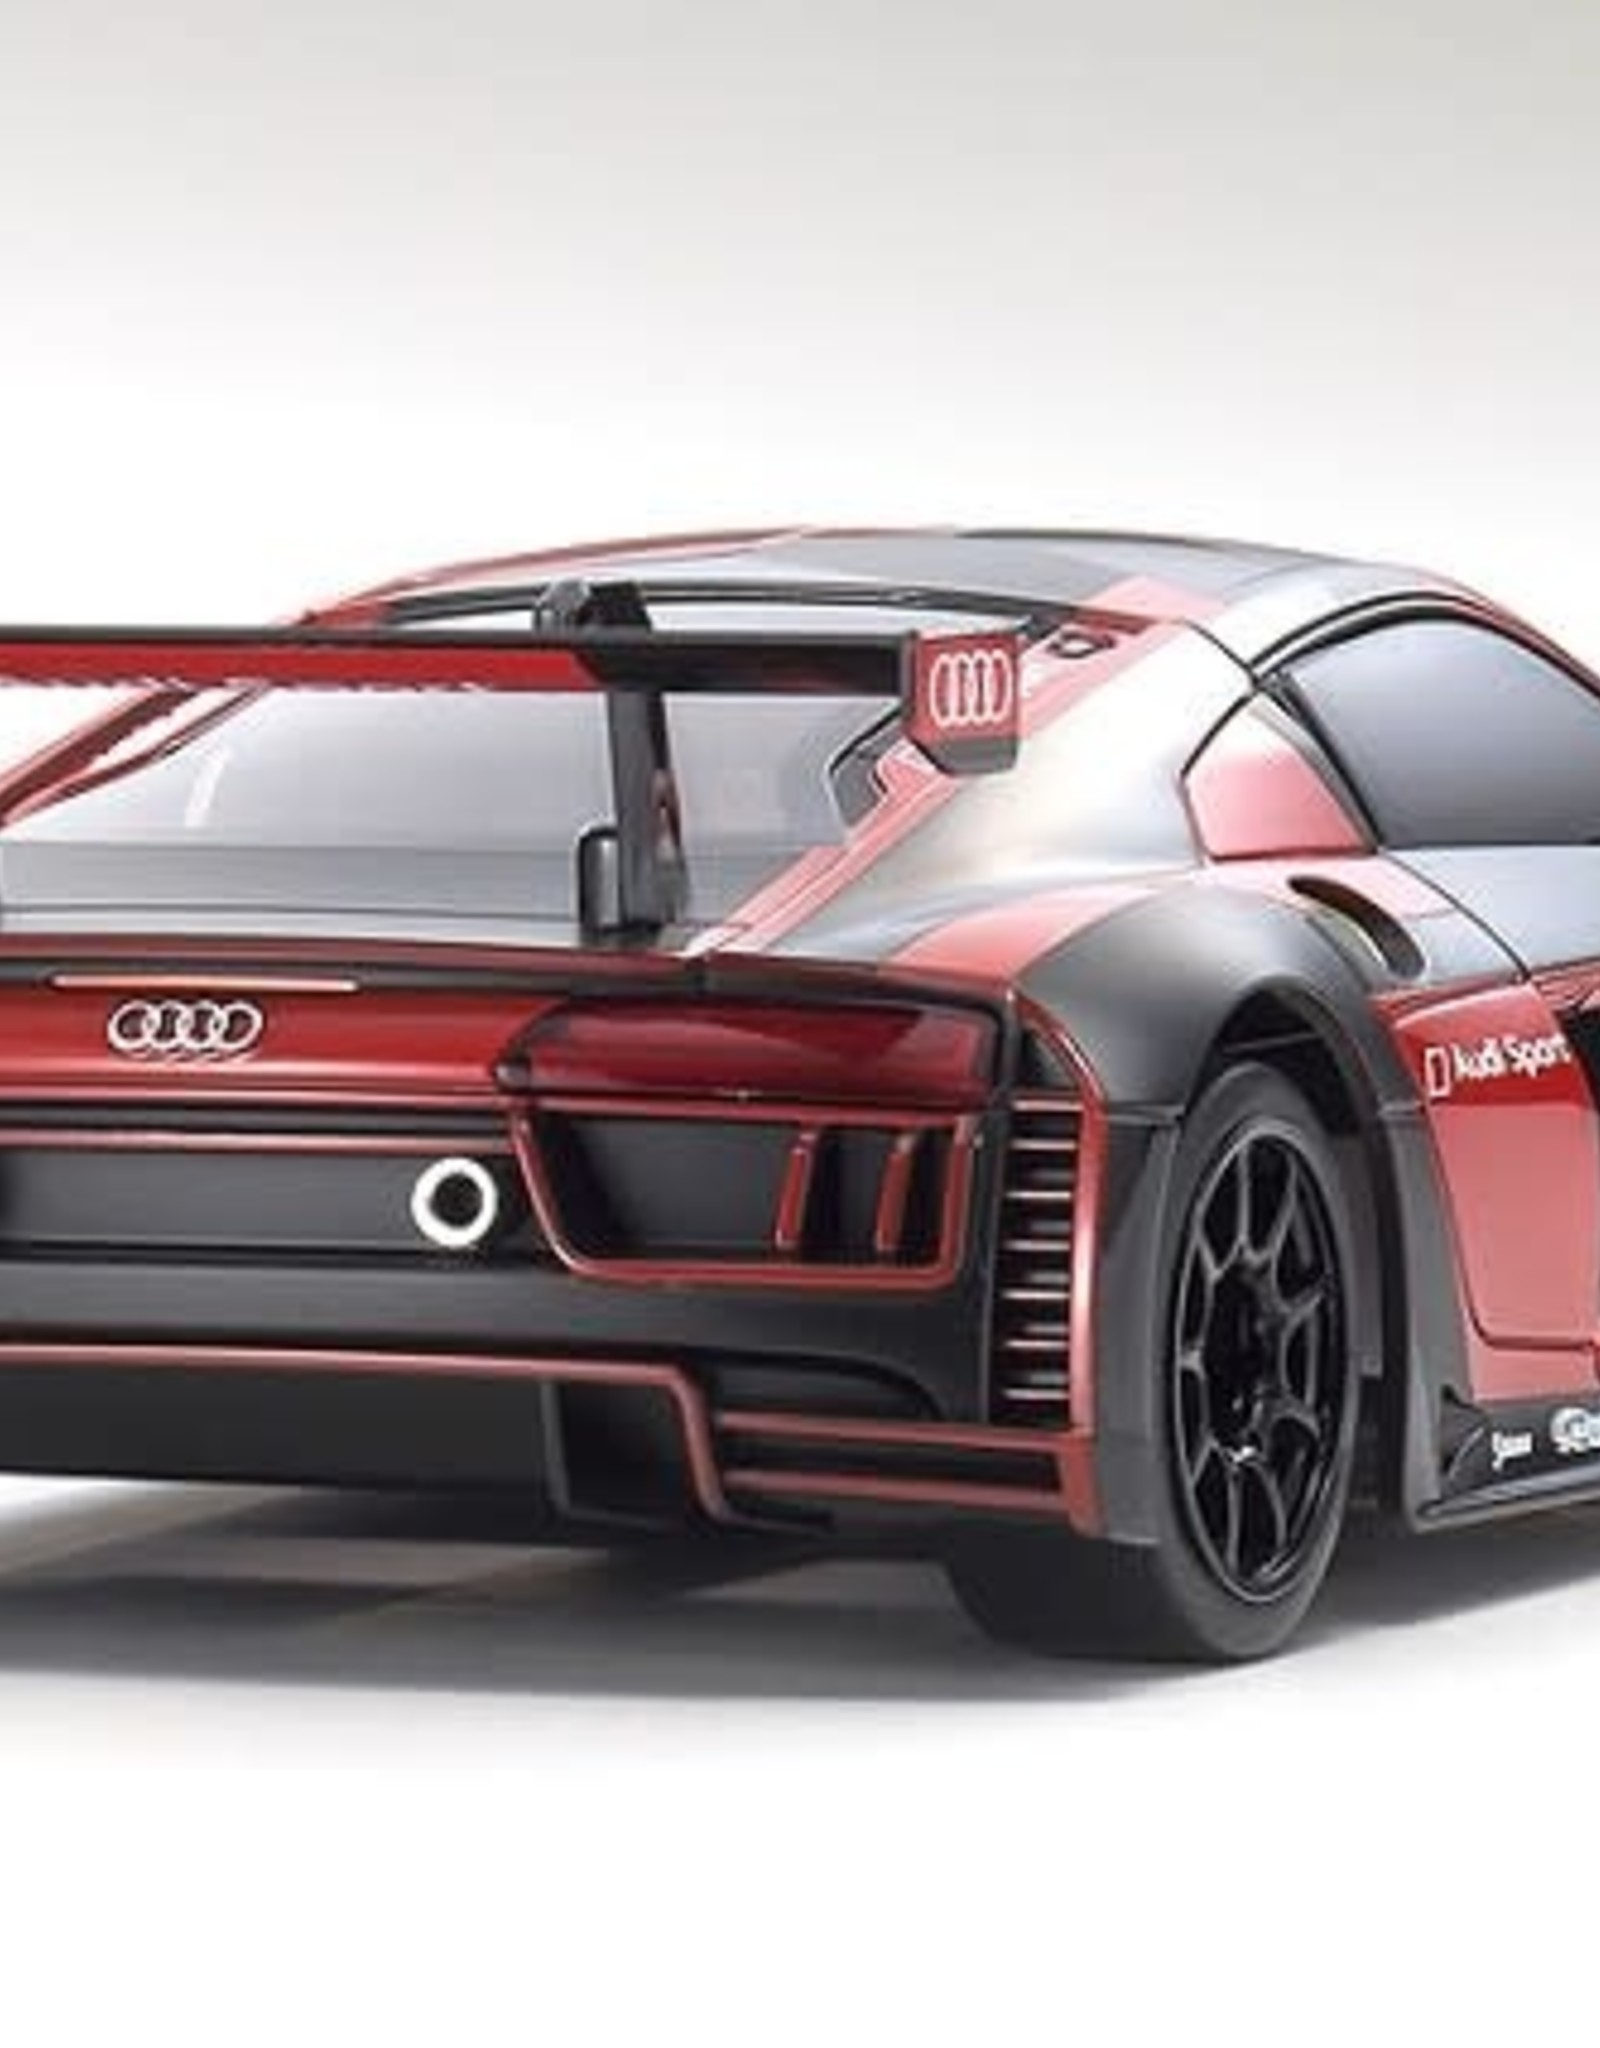 KYOSHO KYOMZP234BKR-B ASC MR-03W-MM ASC Audi R8 LMS 2016 Black/Red